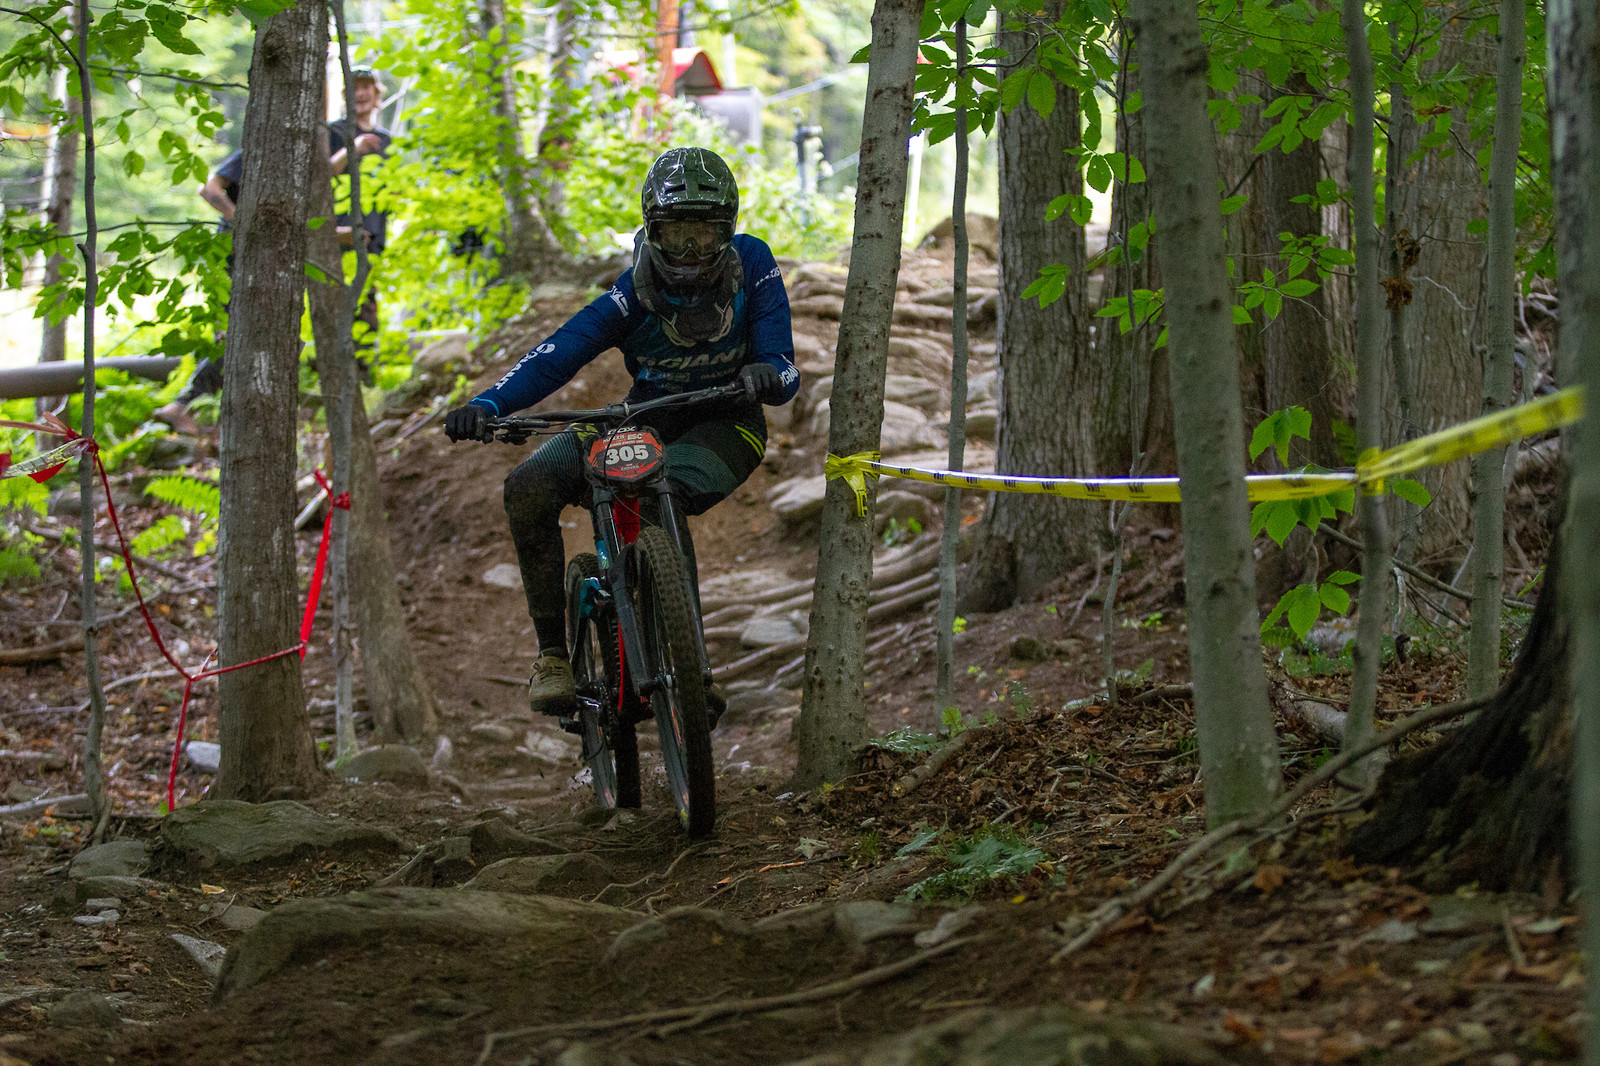 Photo Blast - Eastern States Cup Downhill at Thunder Mountain Bike Park - JackRice - Mountain Biking Pictures - Vital MTB